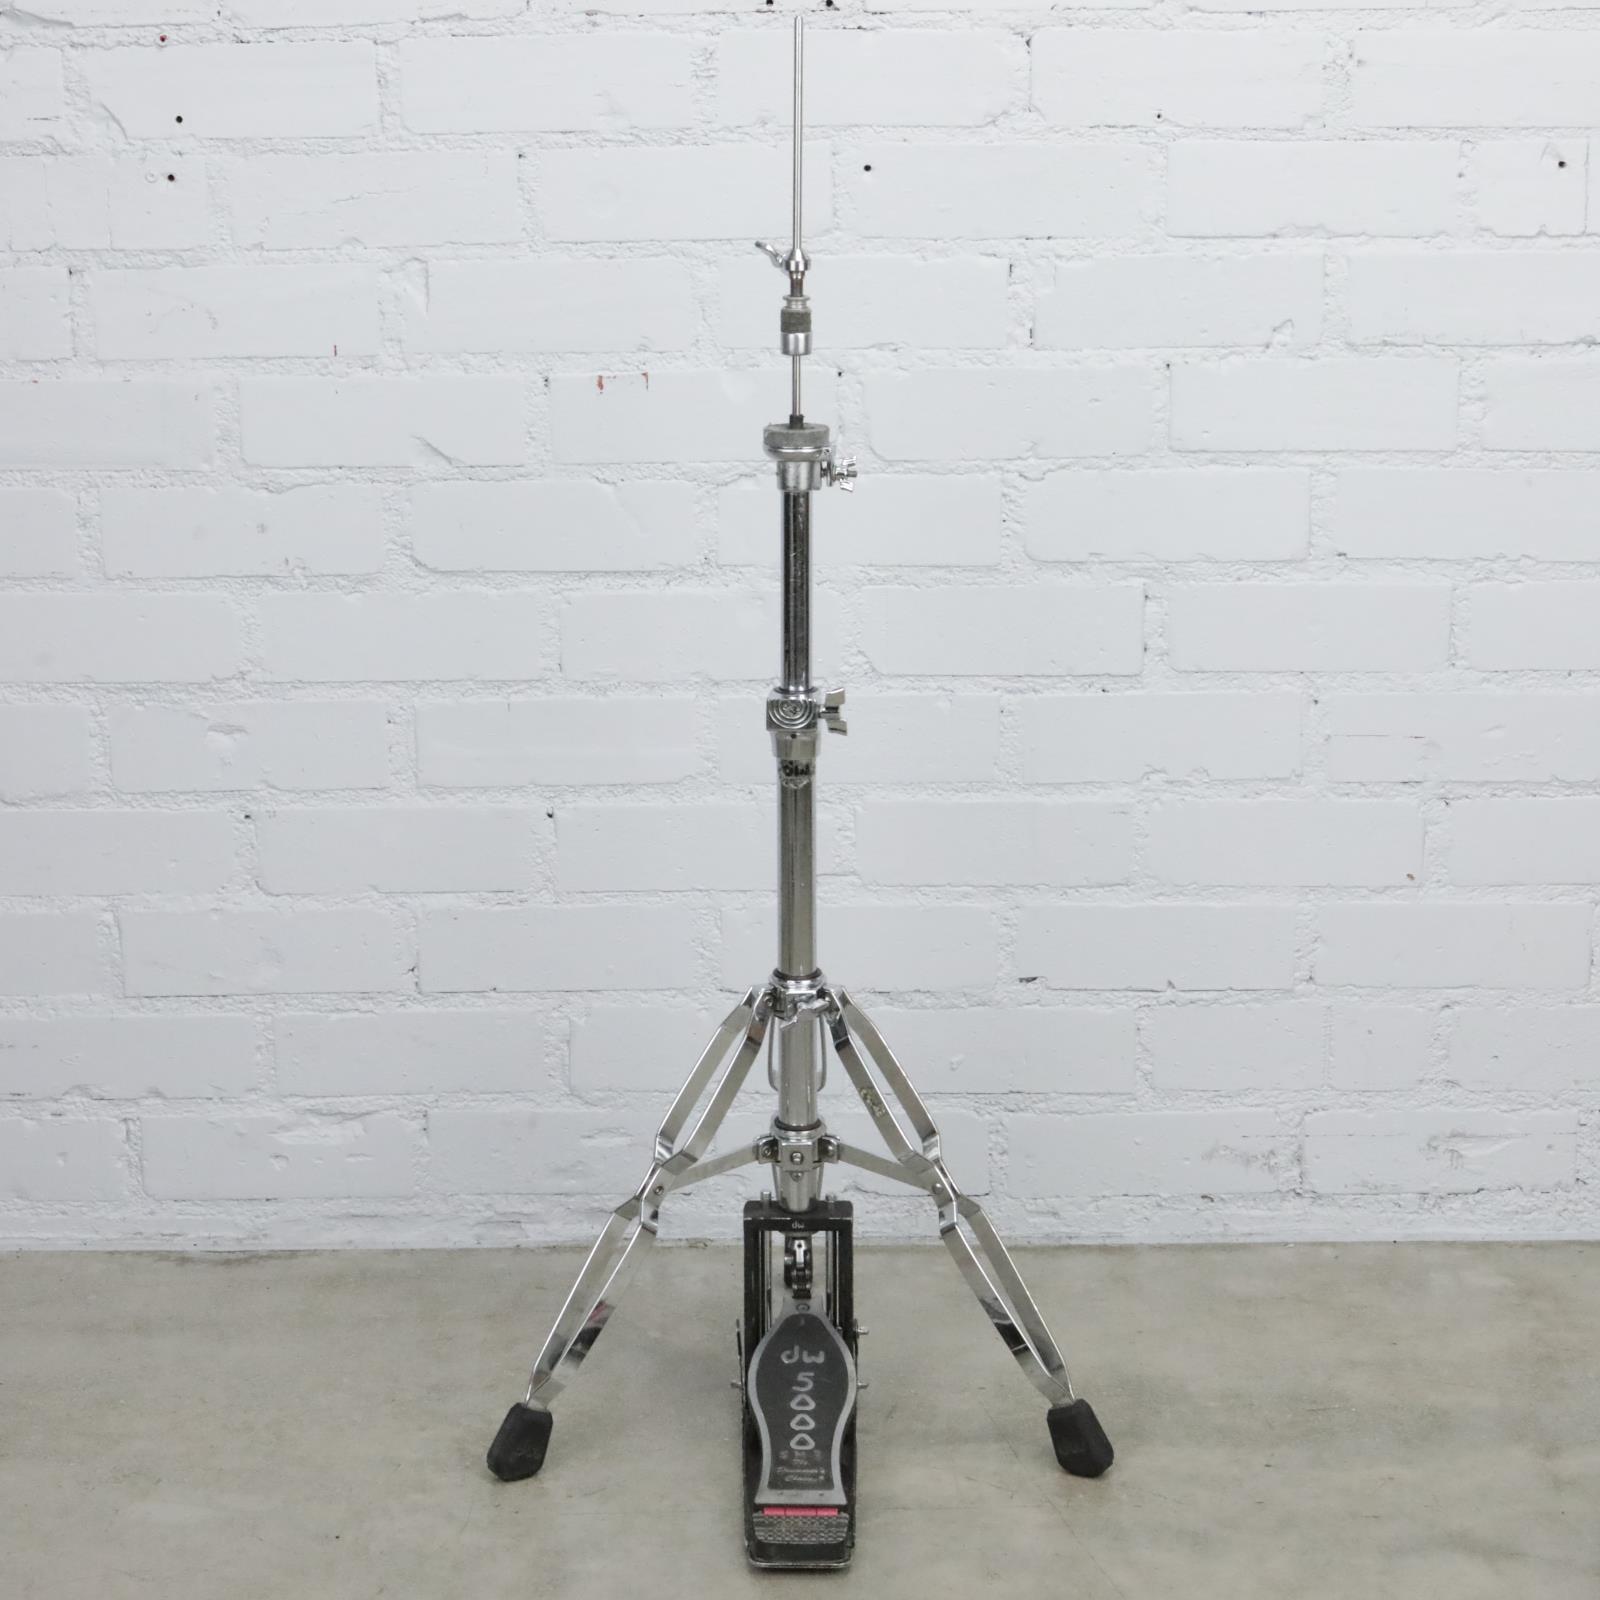 DW 5000 Series 5500D Tri-Leg Double Braced Hi-Hat Stand #41160